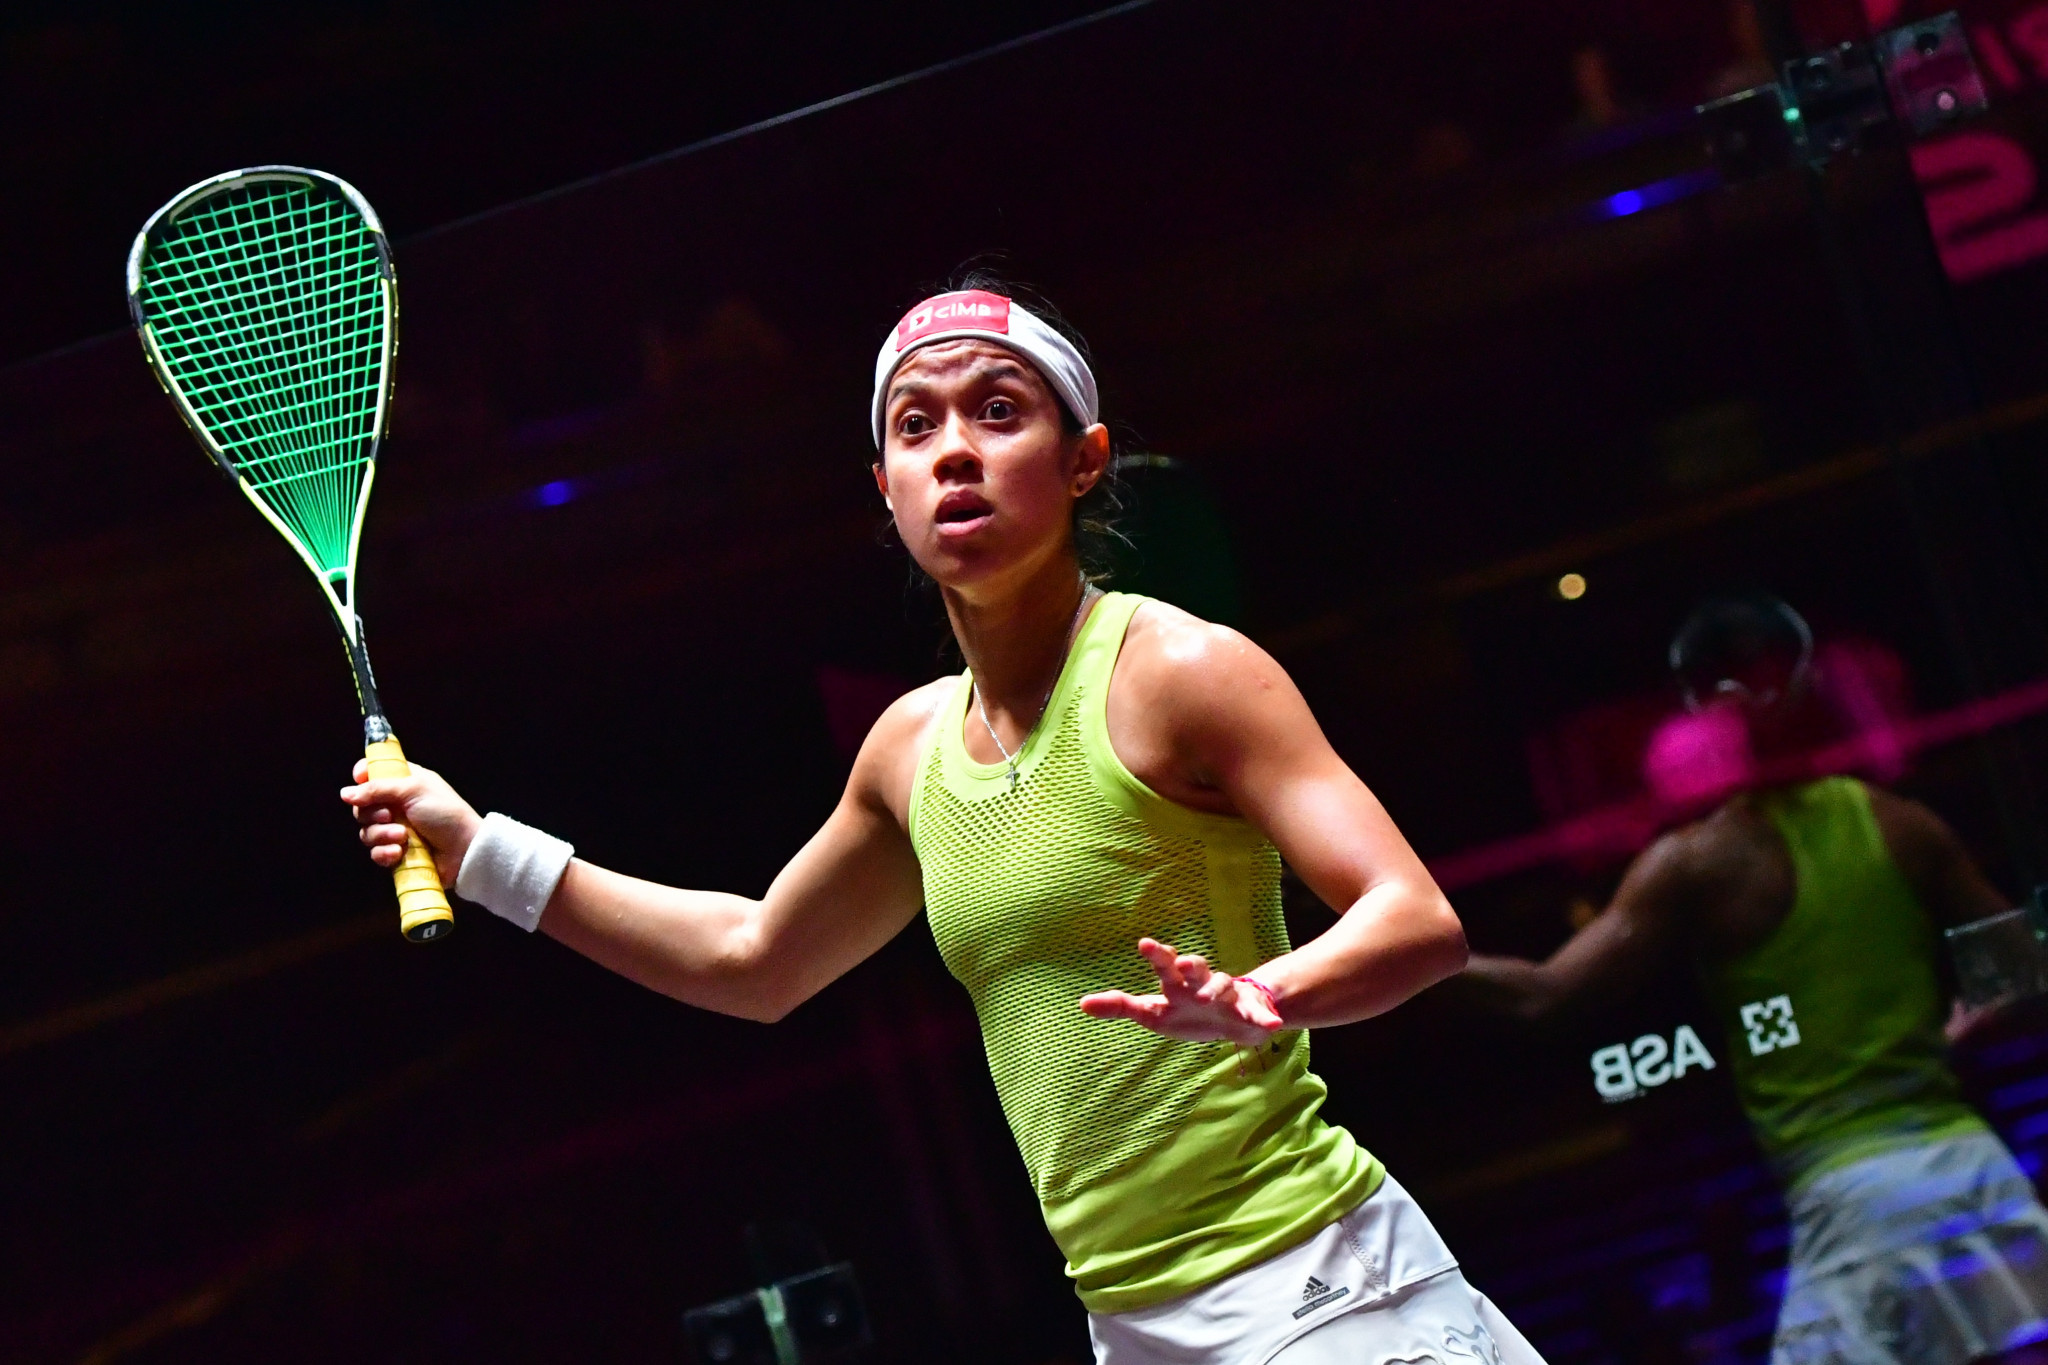 Squash: Kiwi wins first round in Saudi Arabia